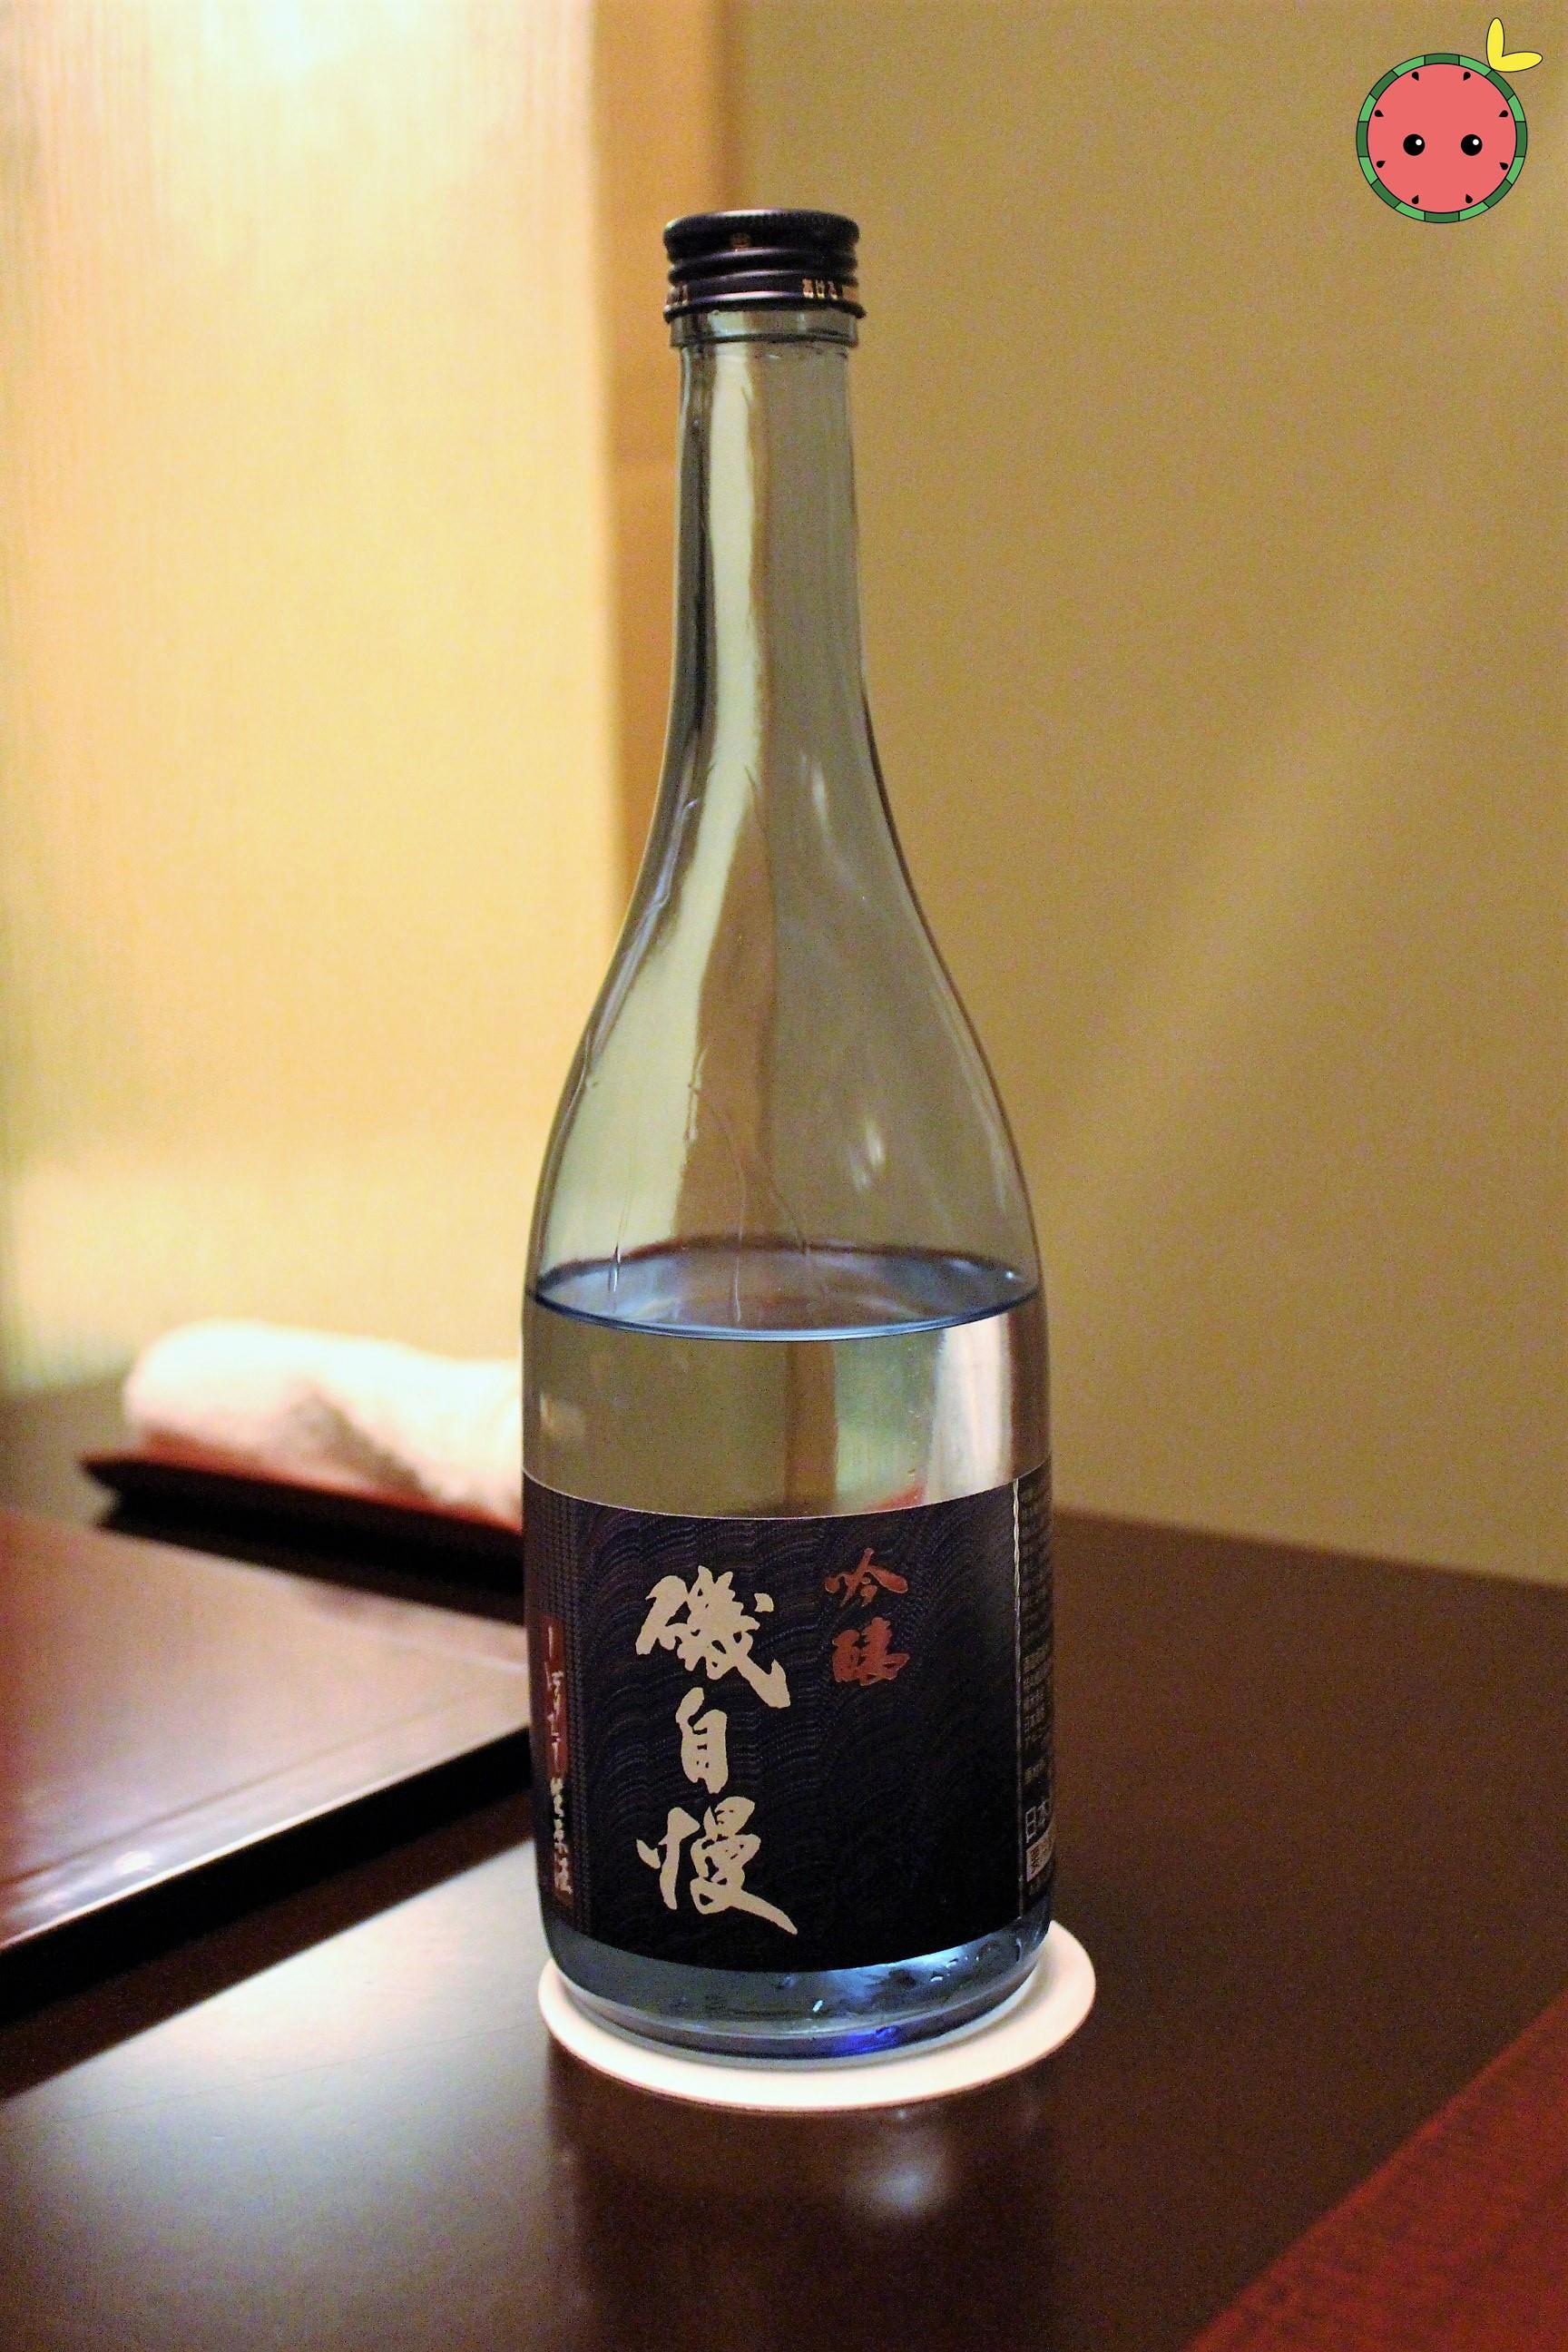 Isojiman Ginjo Genshu Sake